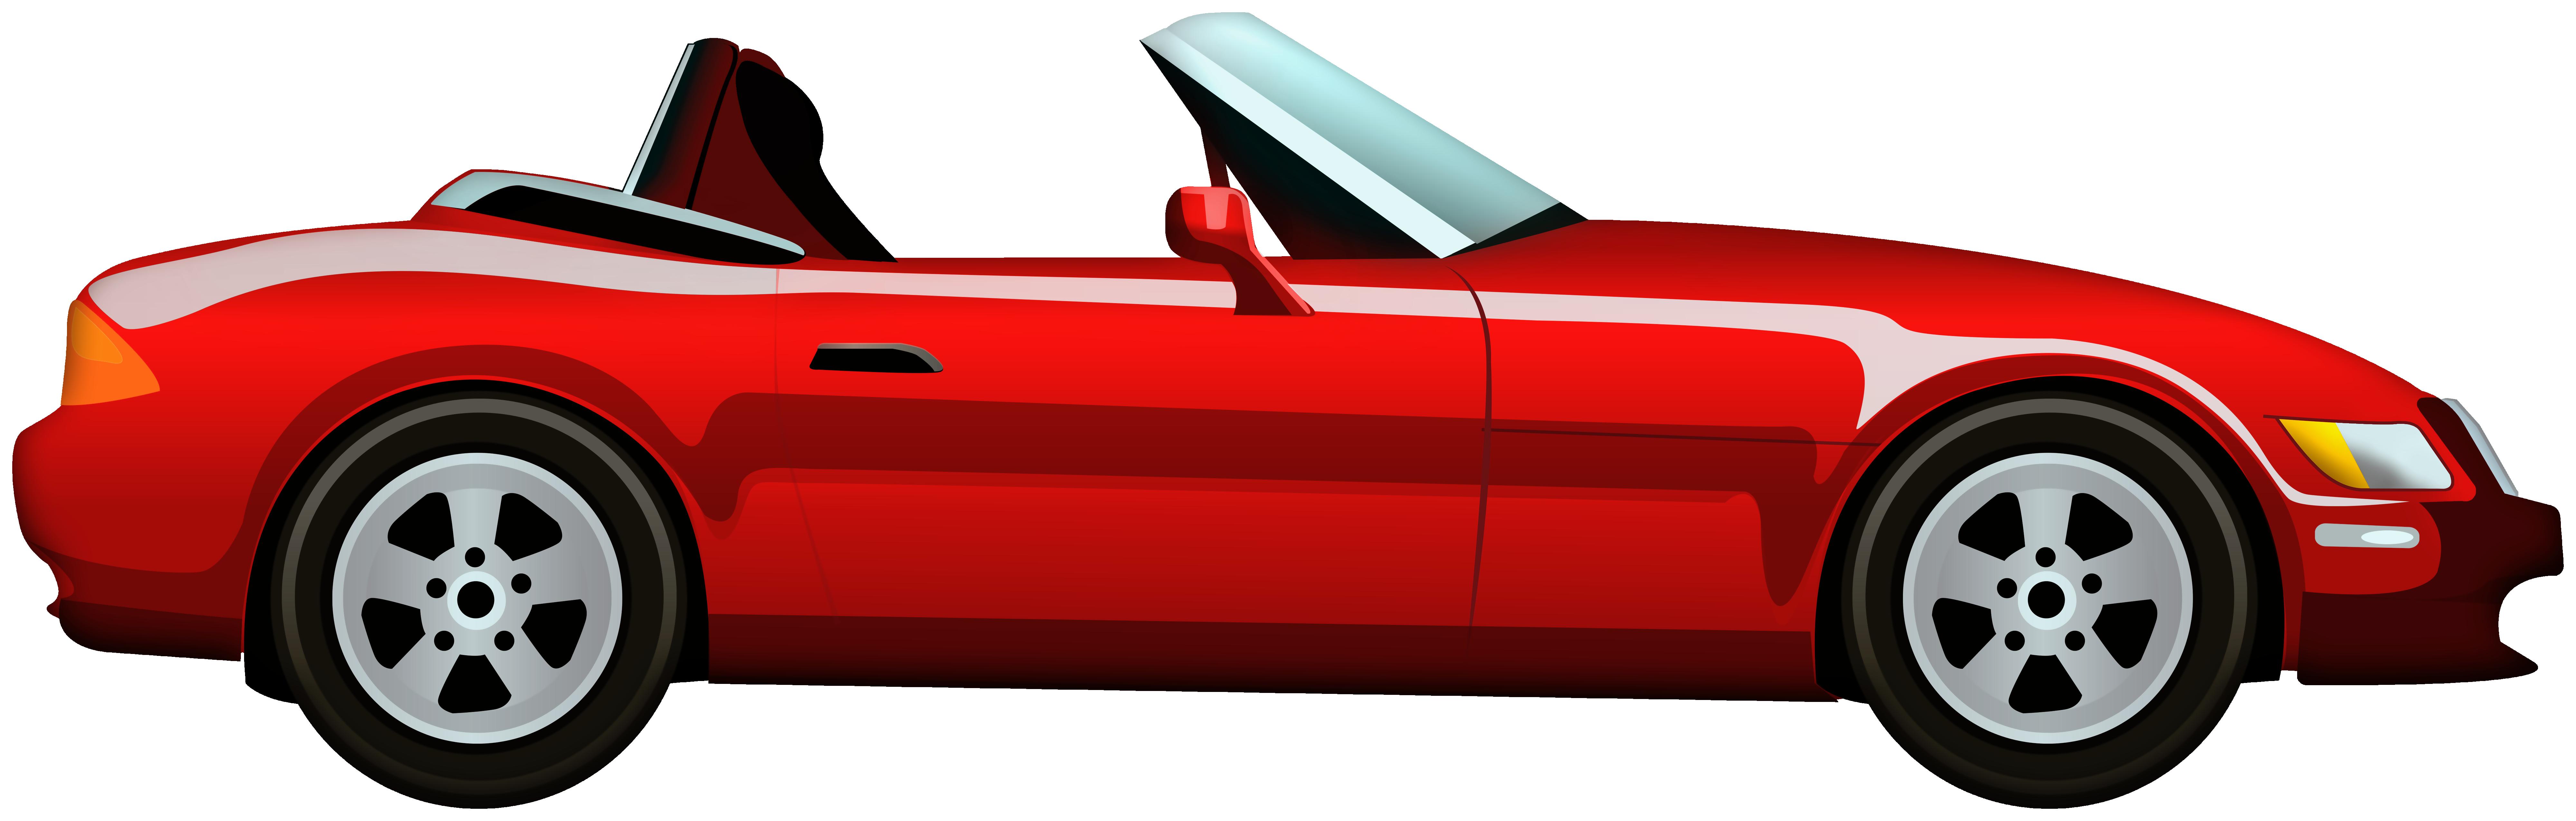 Red Cabriolet Car PNG Clip Art